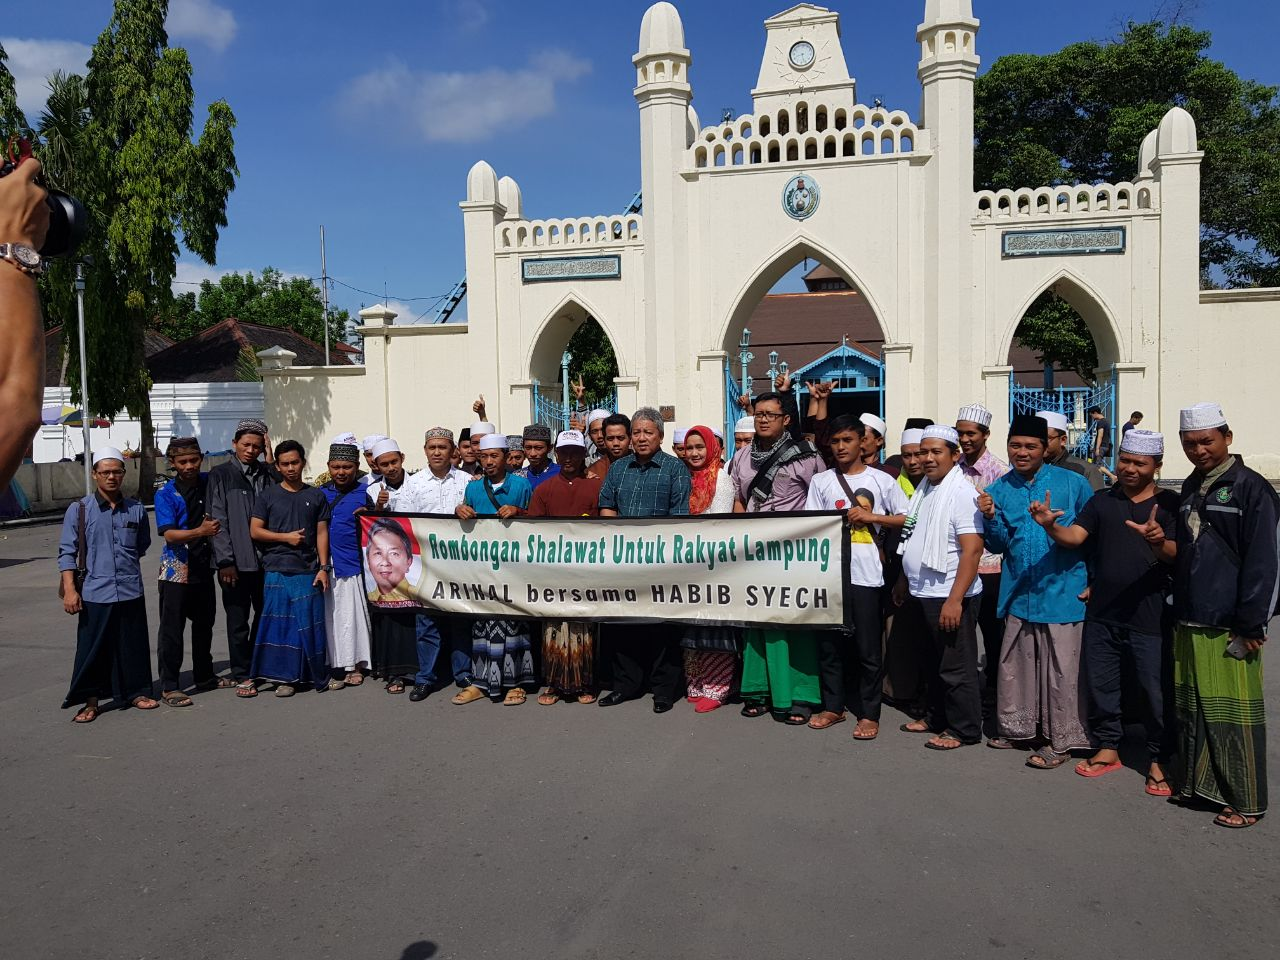 Peserta Wisata Religi ke Ponpes Habib Syech, Solo Mengaku Senang